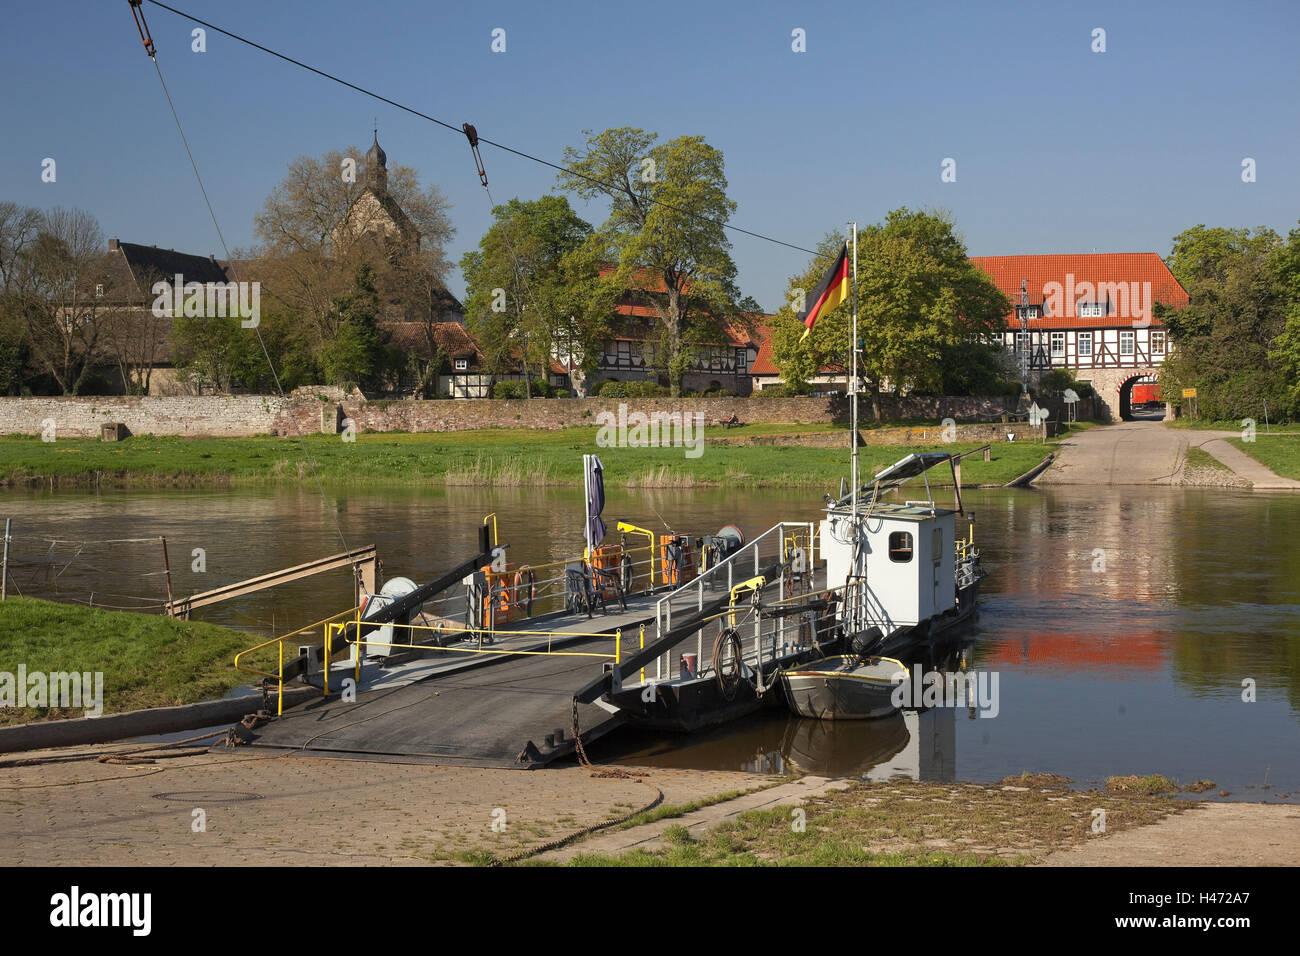 Germany, Lower Saxony, Weser ferry Grohnde, - Stock Image